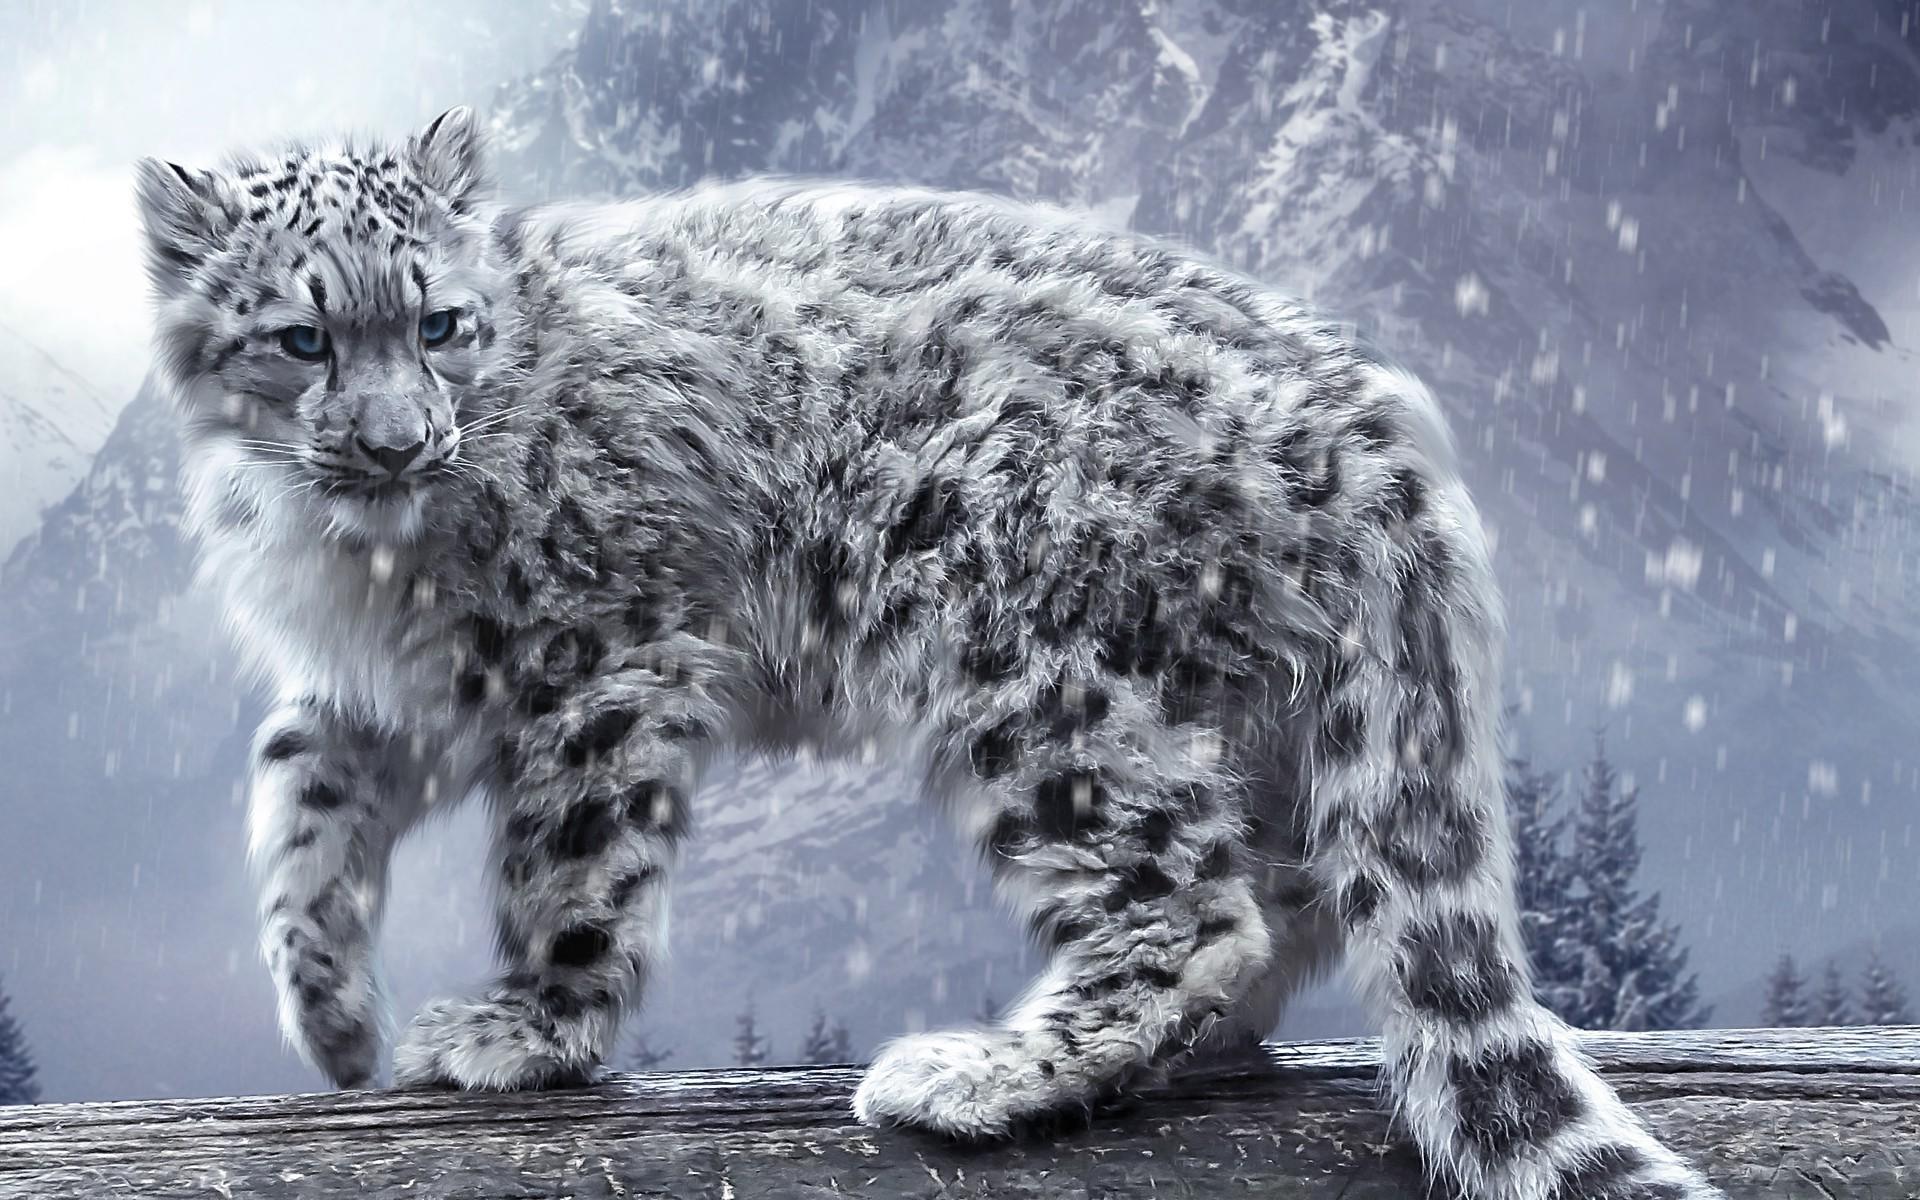 Snow leopard wallpaper   1033945 1920x1200